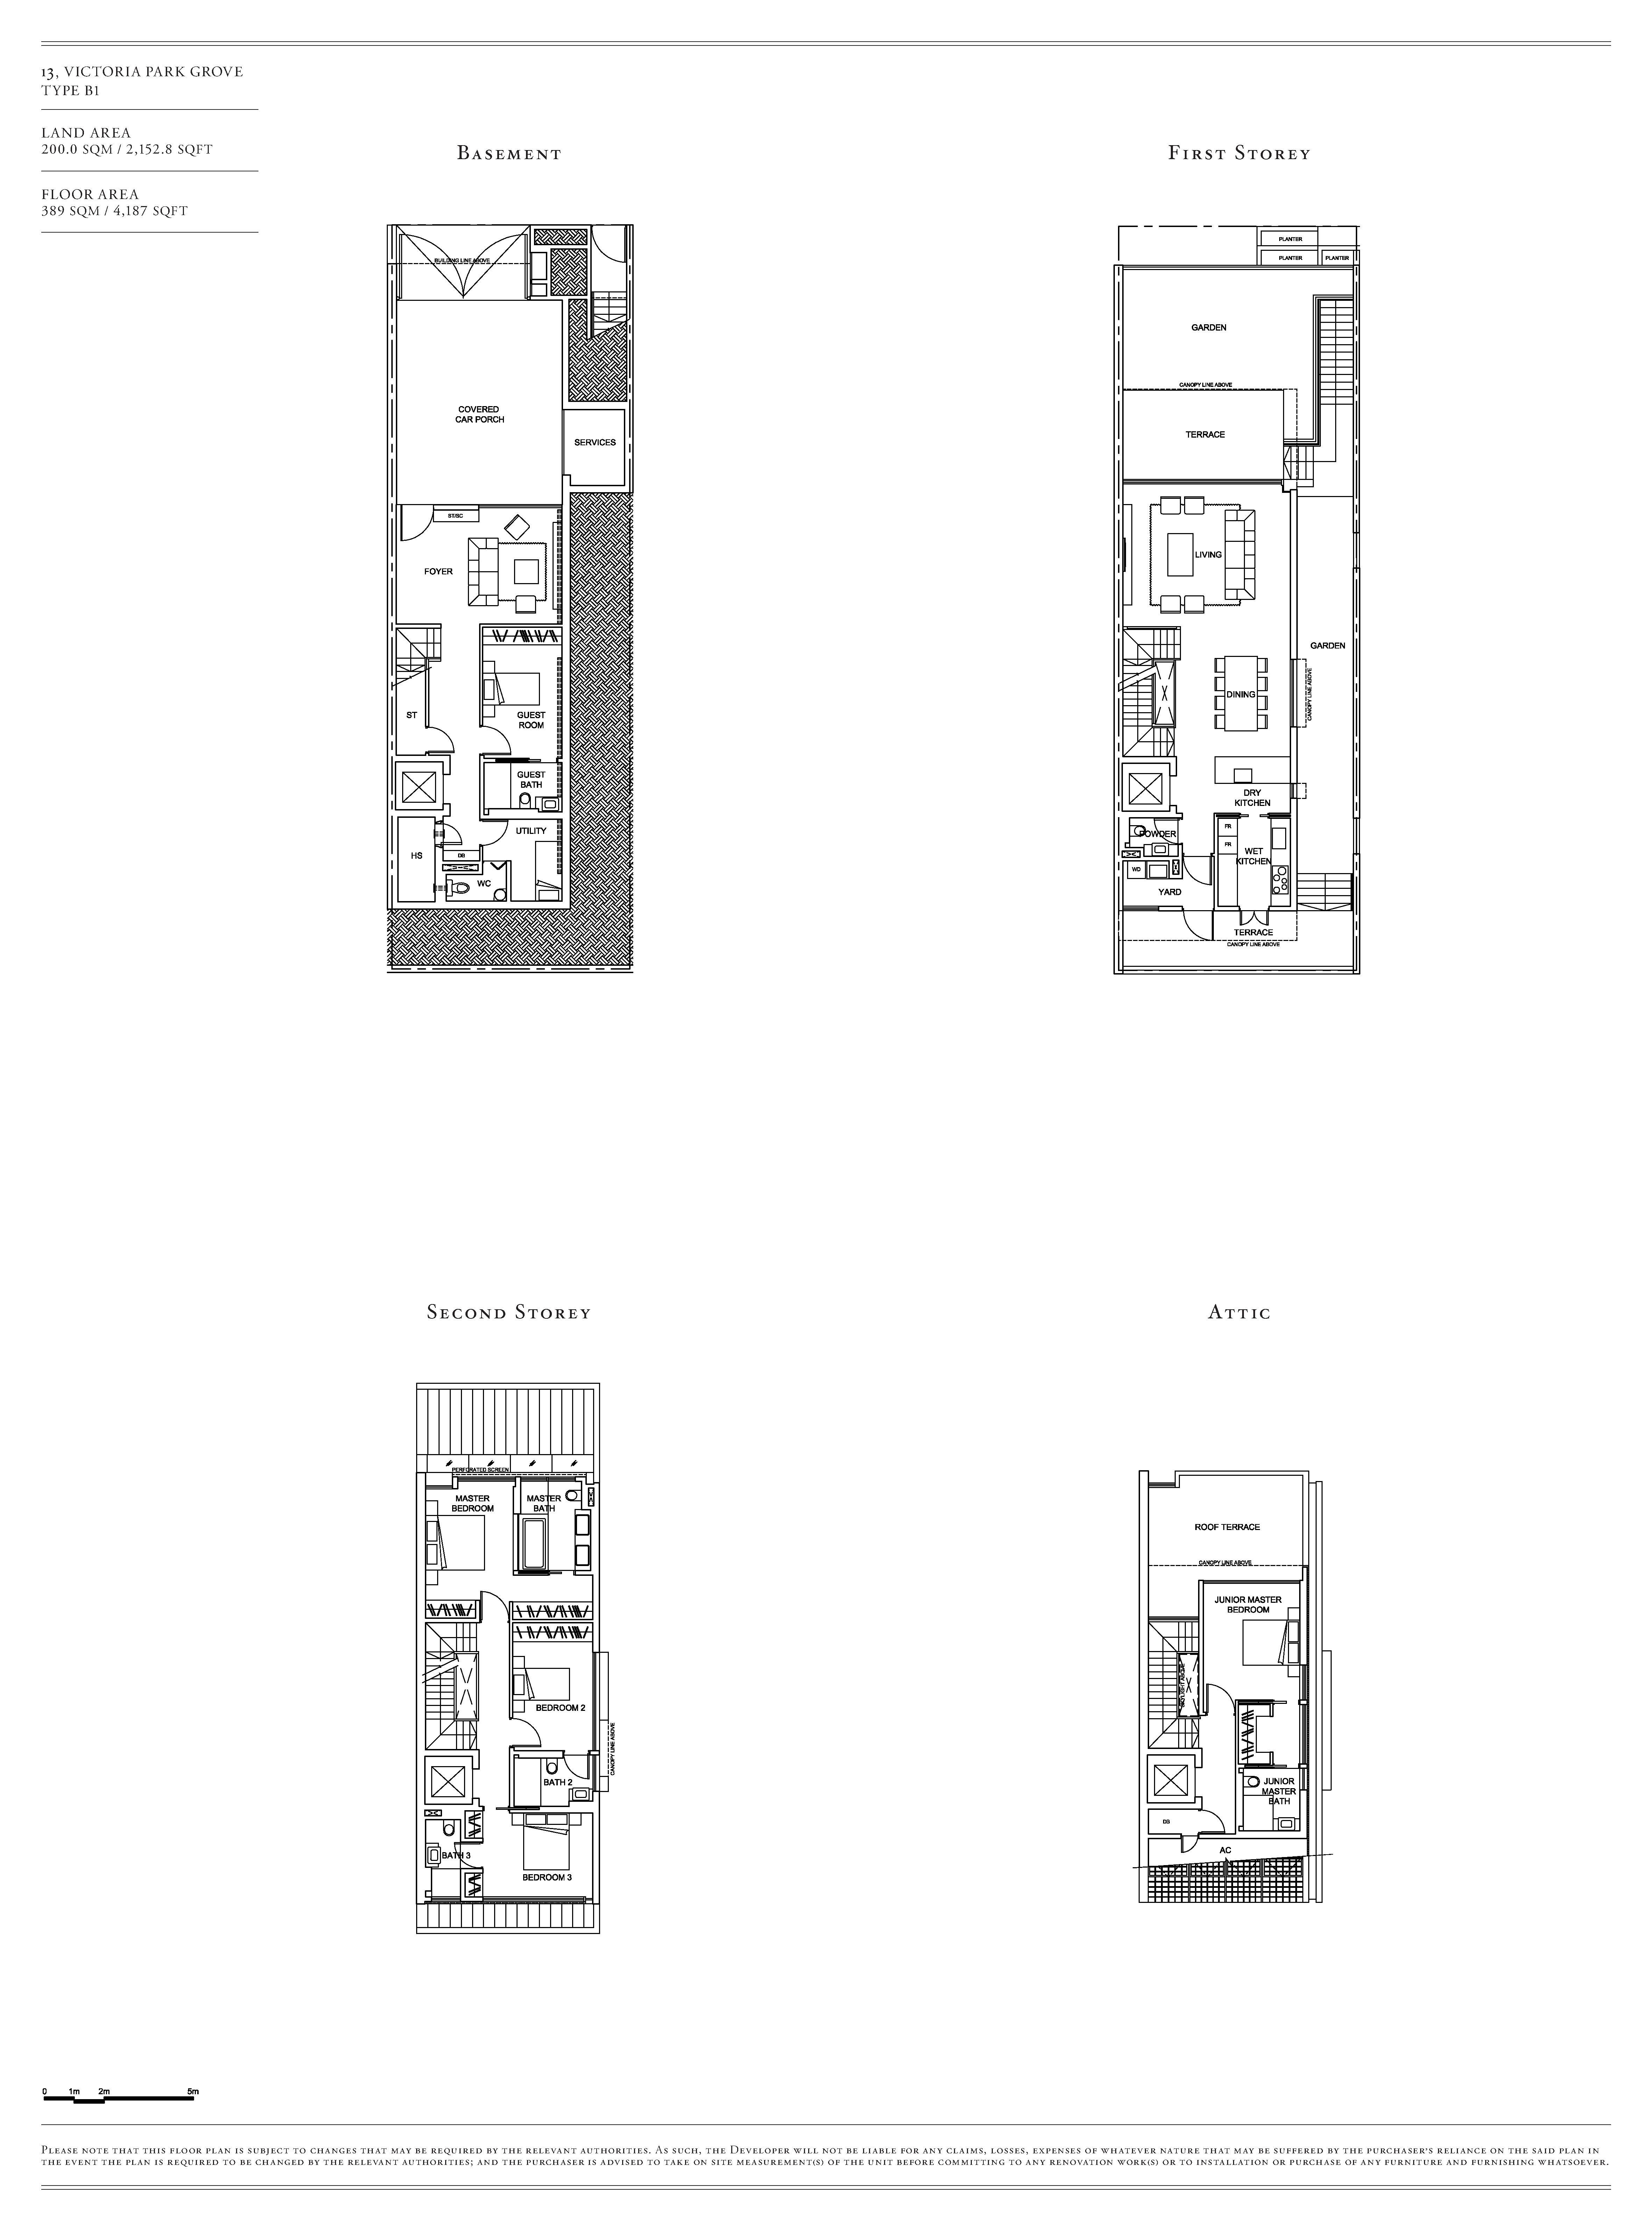 Victoria Park Villas House 13 Type B1 Floor Plans